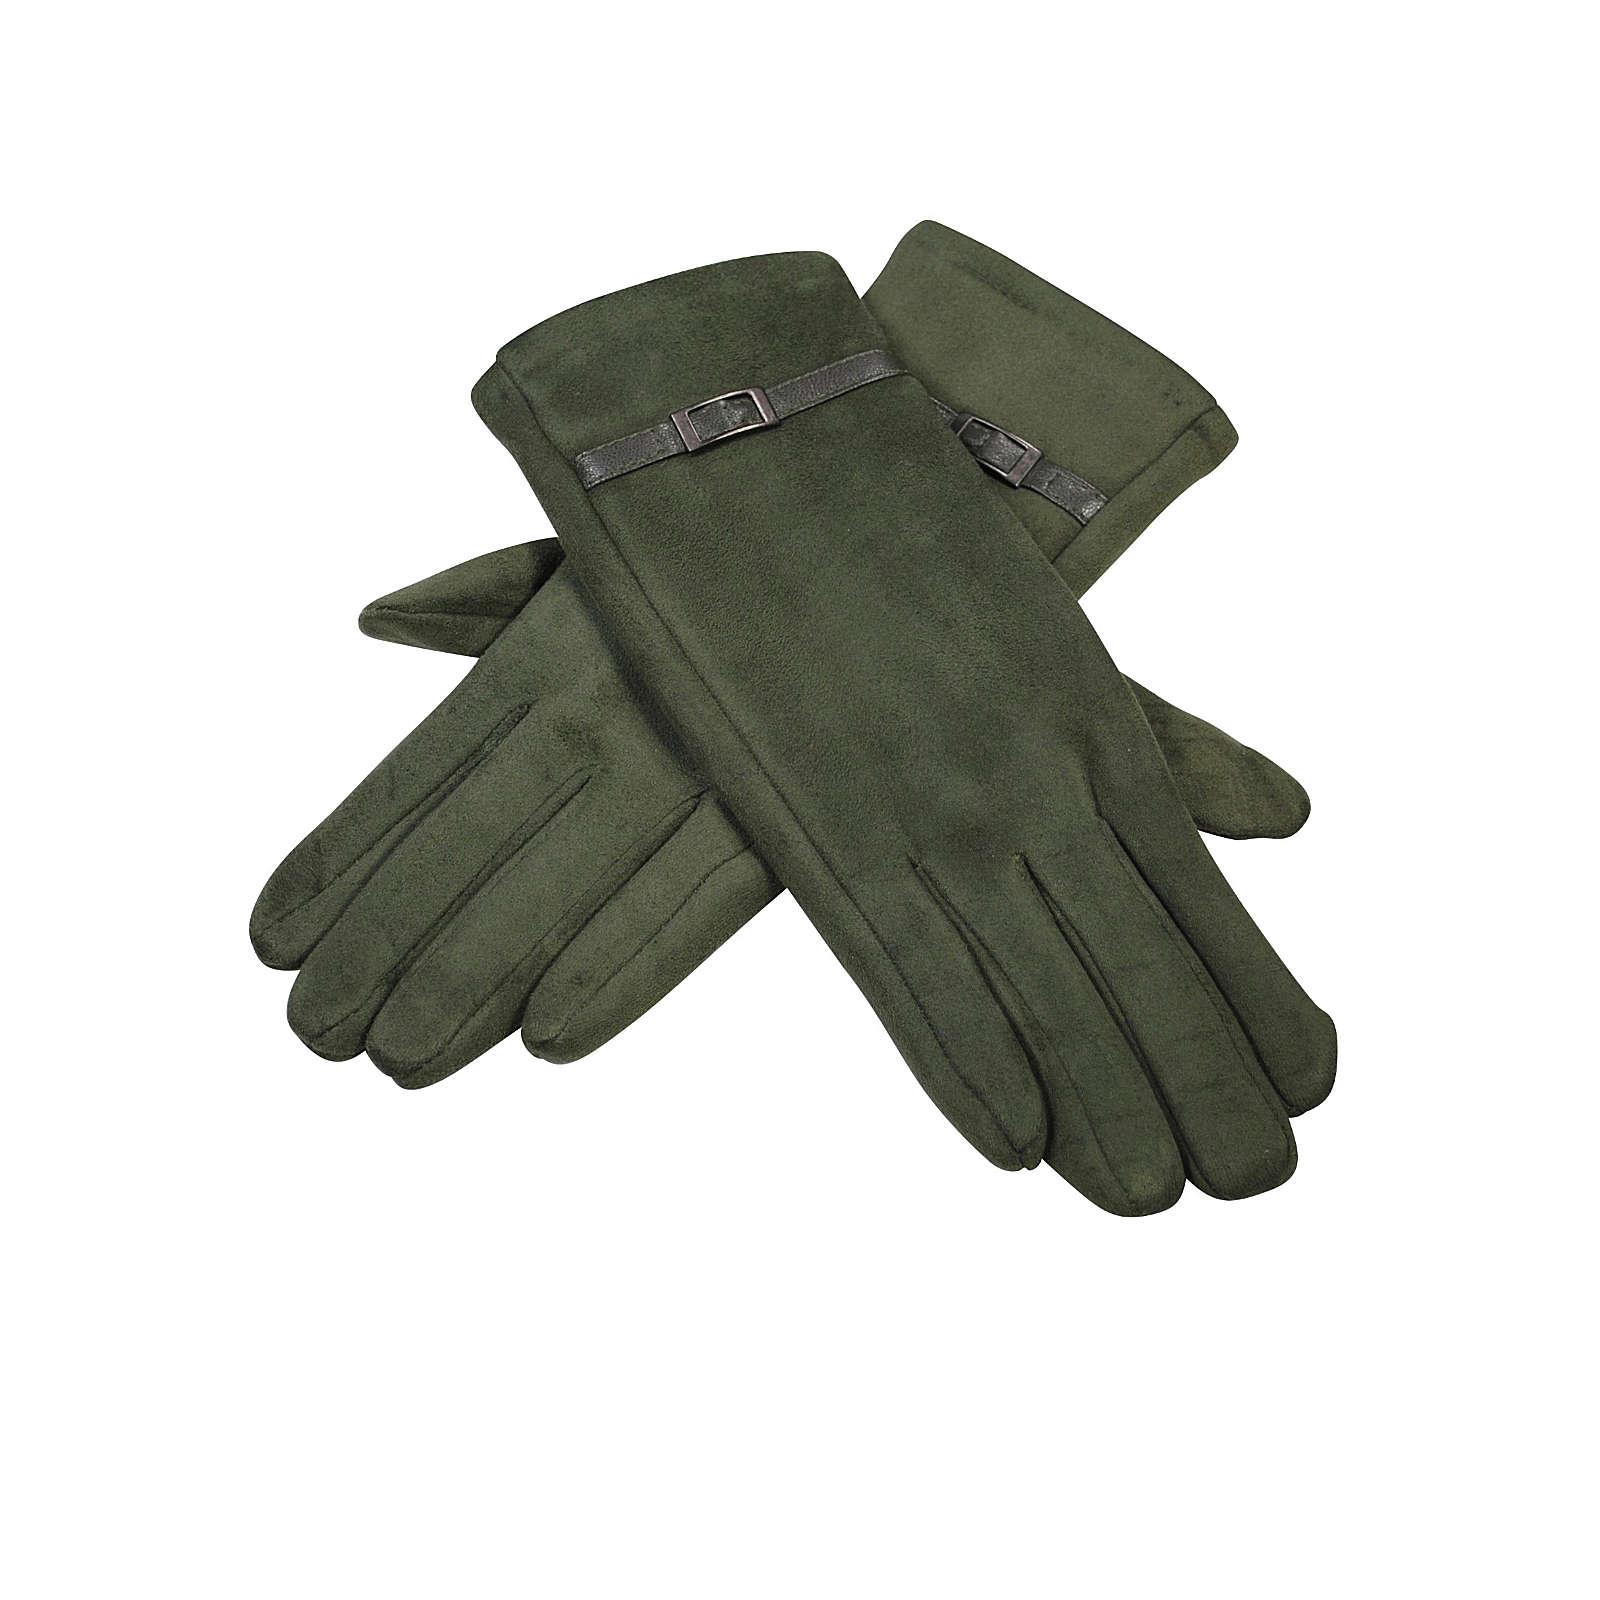 Simone Erto Handschuhe Ova Fingerhandschuhe grün Damen